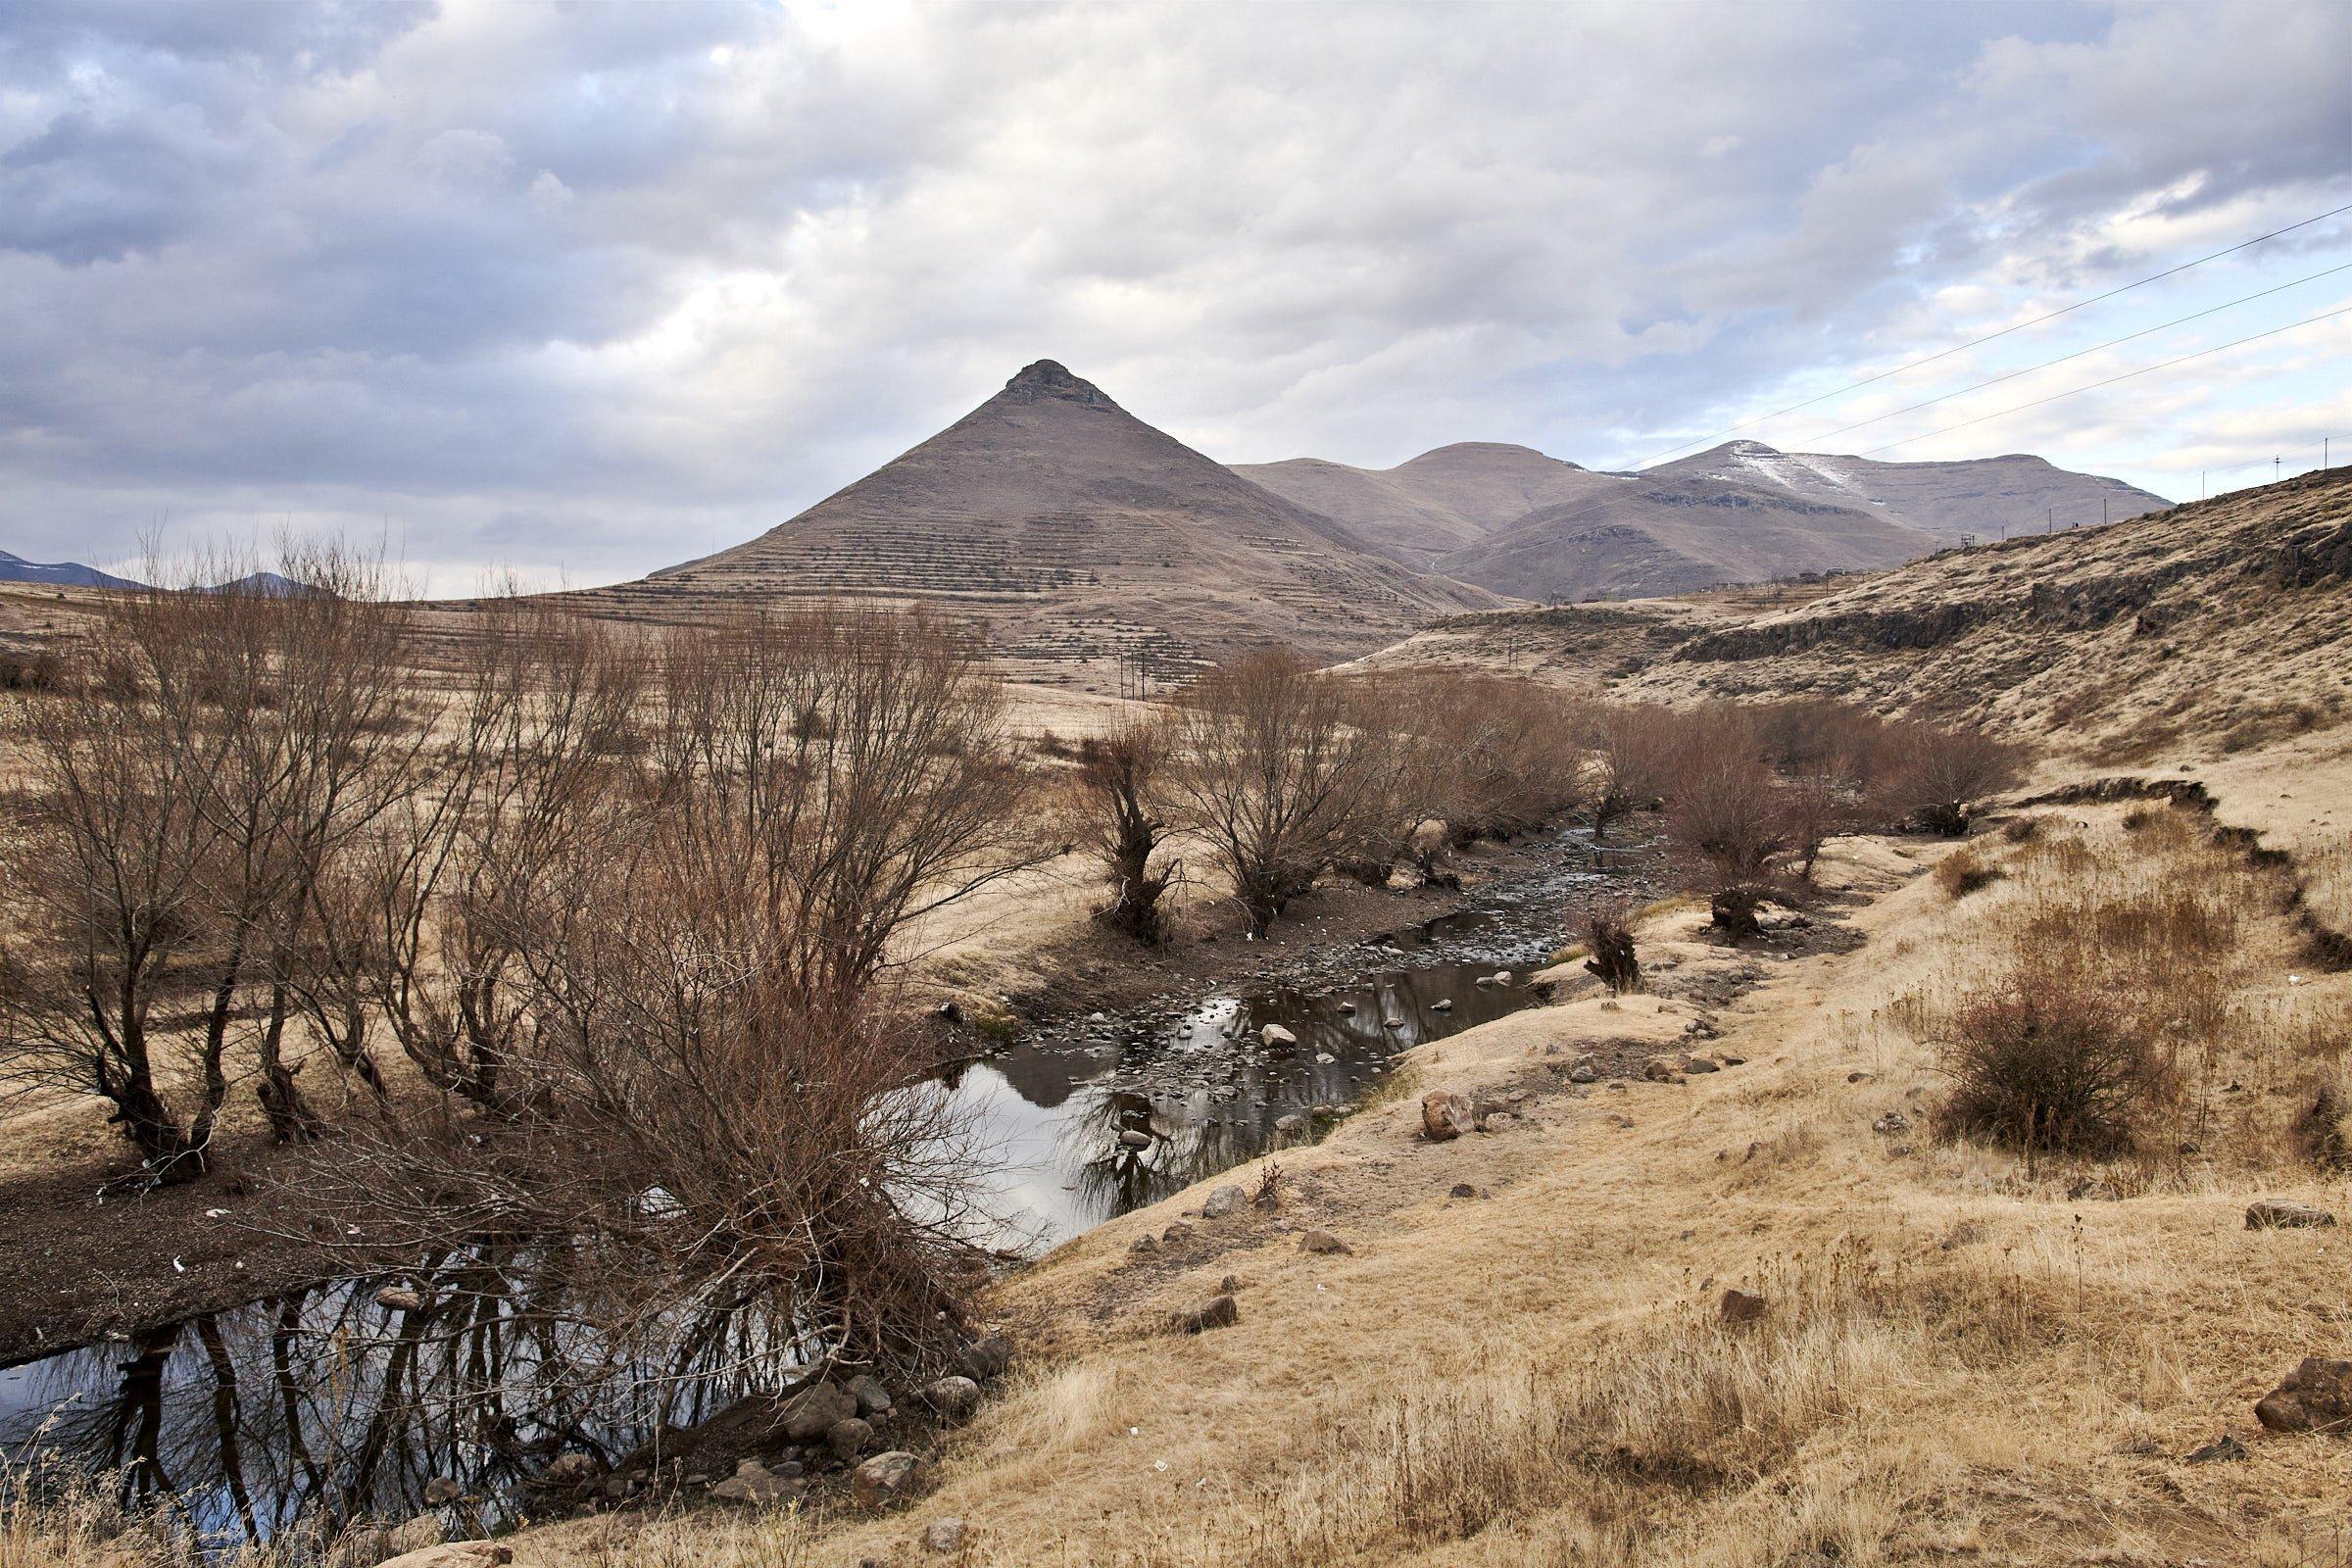 An dem Flussufer im Hochland Lesothos ist Erosion sichtbar, dahinter ragt ein pyramidenförmiger Berg in den Himmel